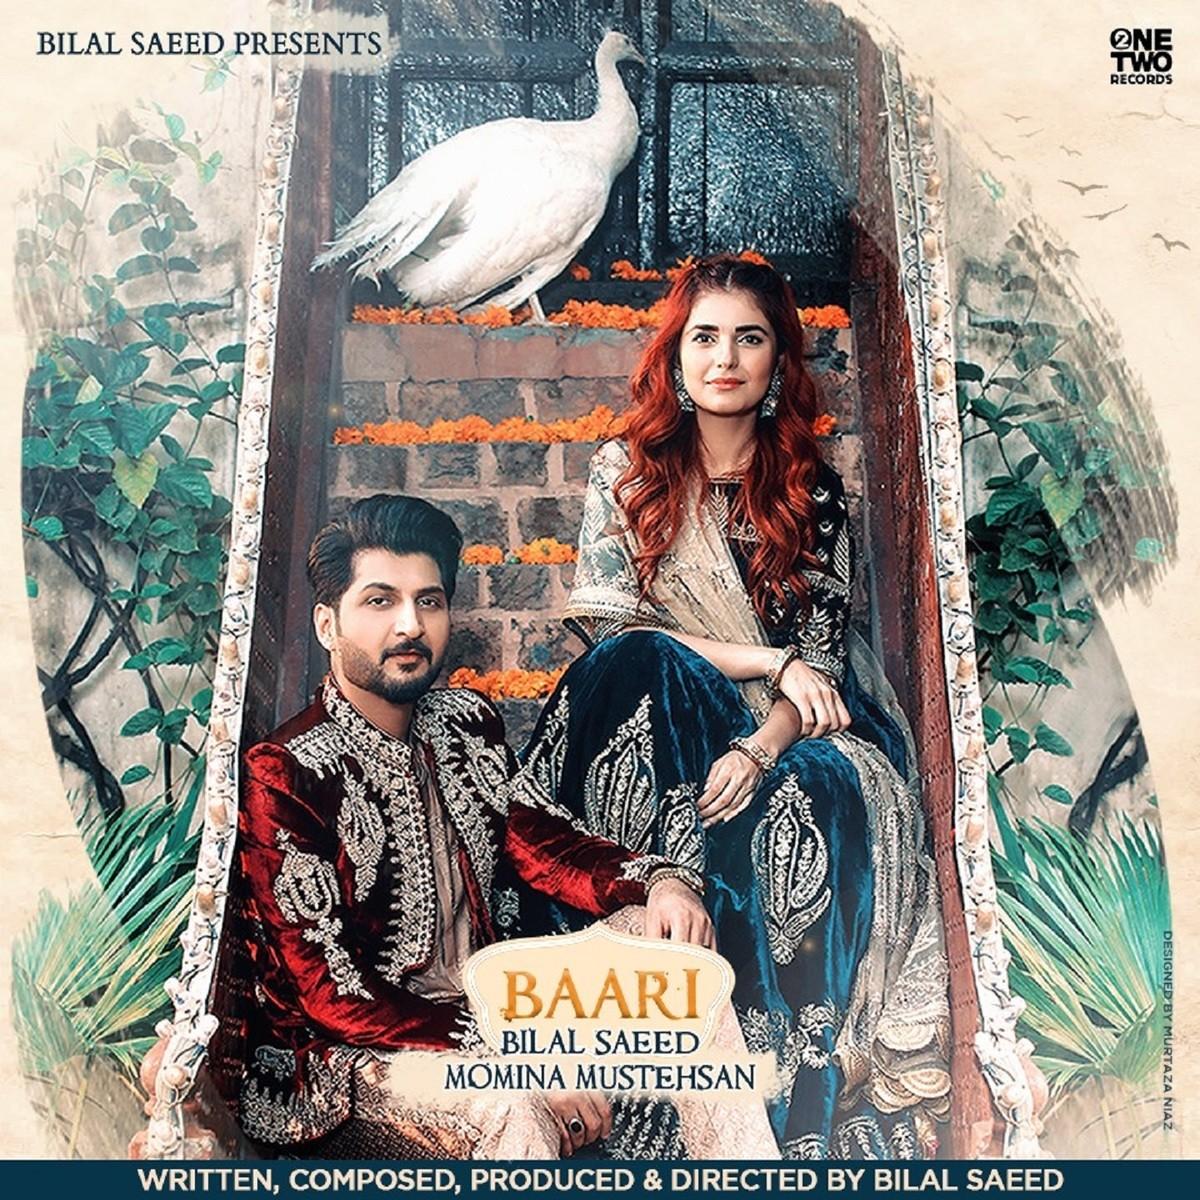 Baari mp3 song download baari baari punjabi song by bilal saeed.